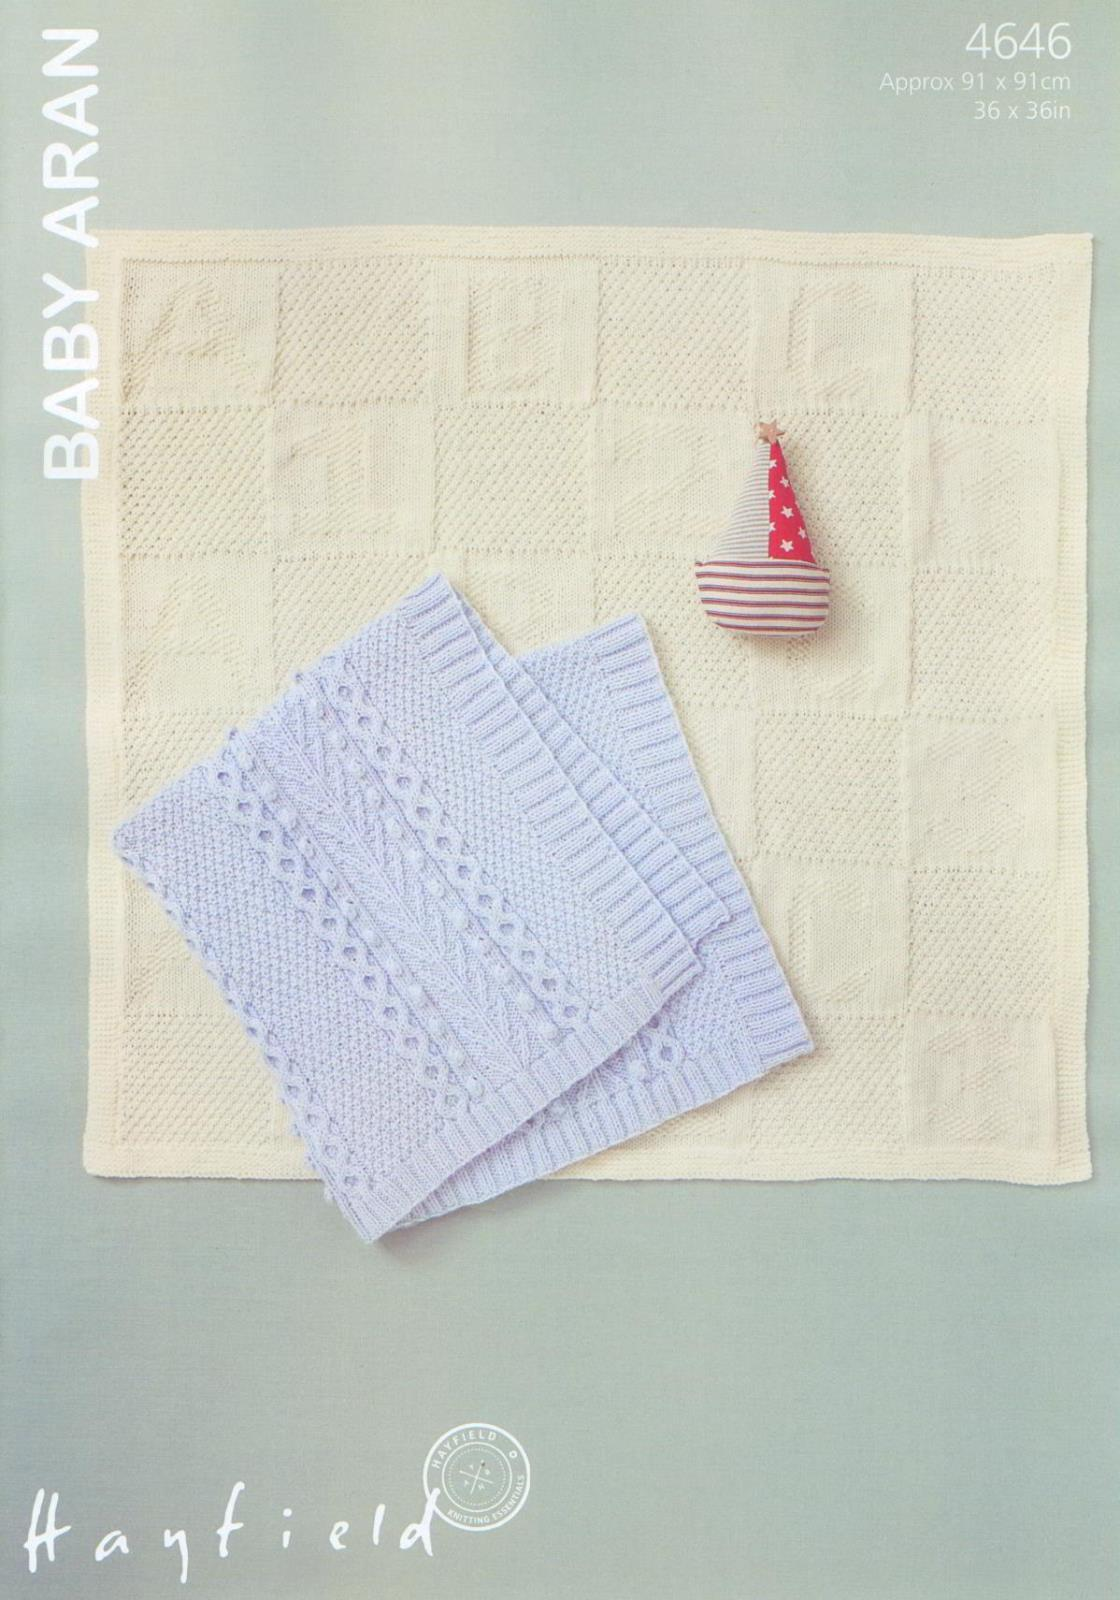 4646 hayfield baby aran blanket knitting pattern approx 91 x 91cm bankloansurffo Choice Image